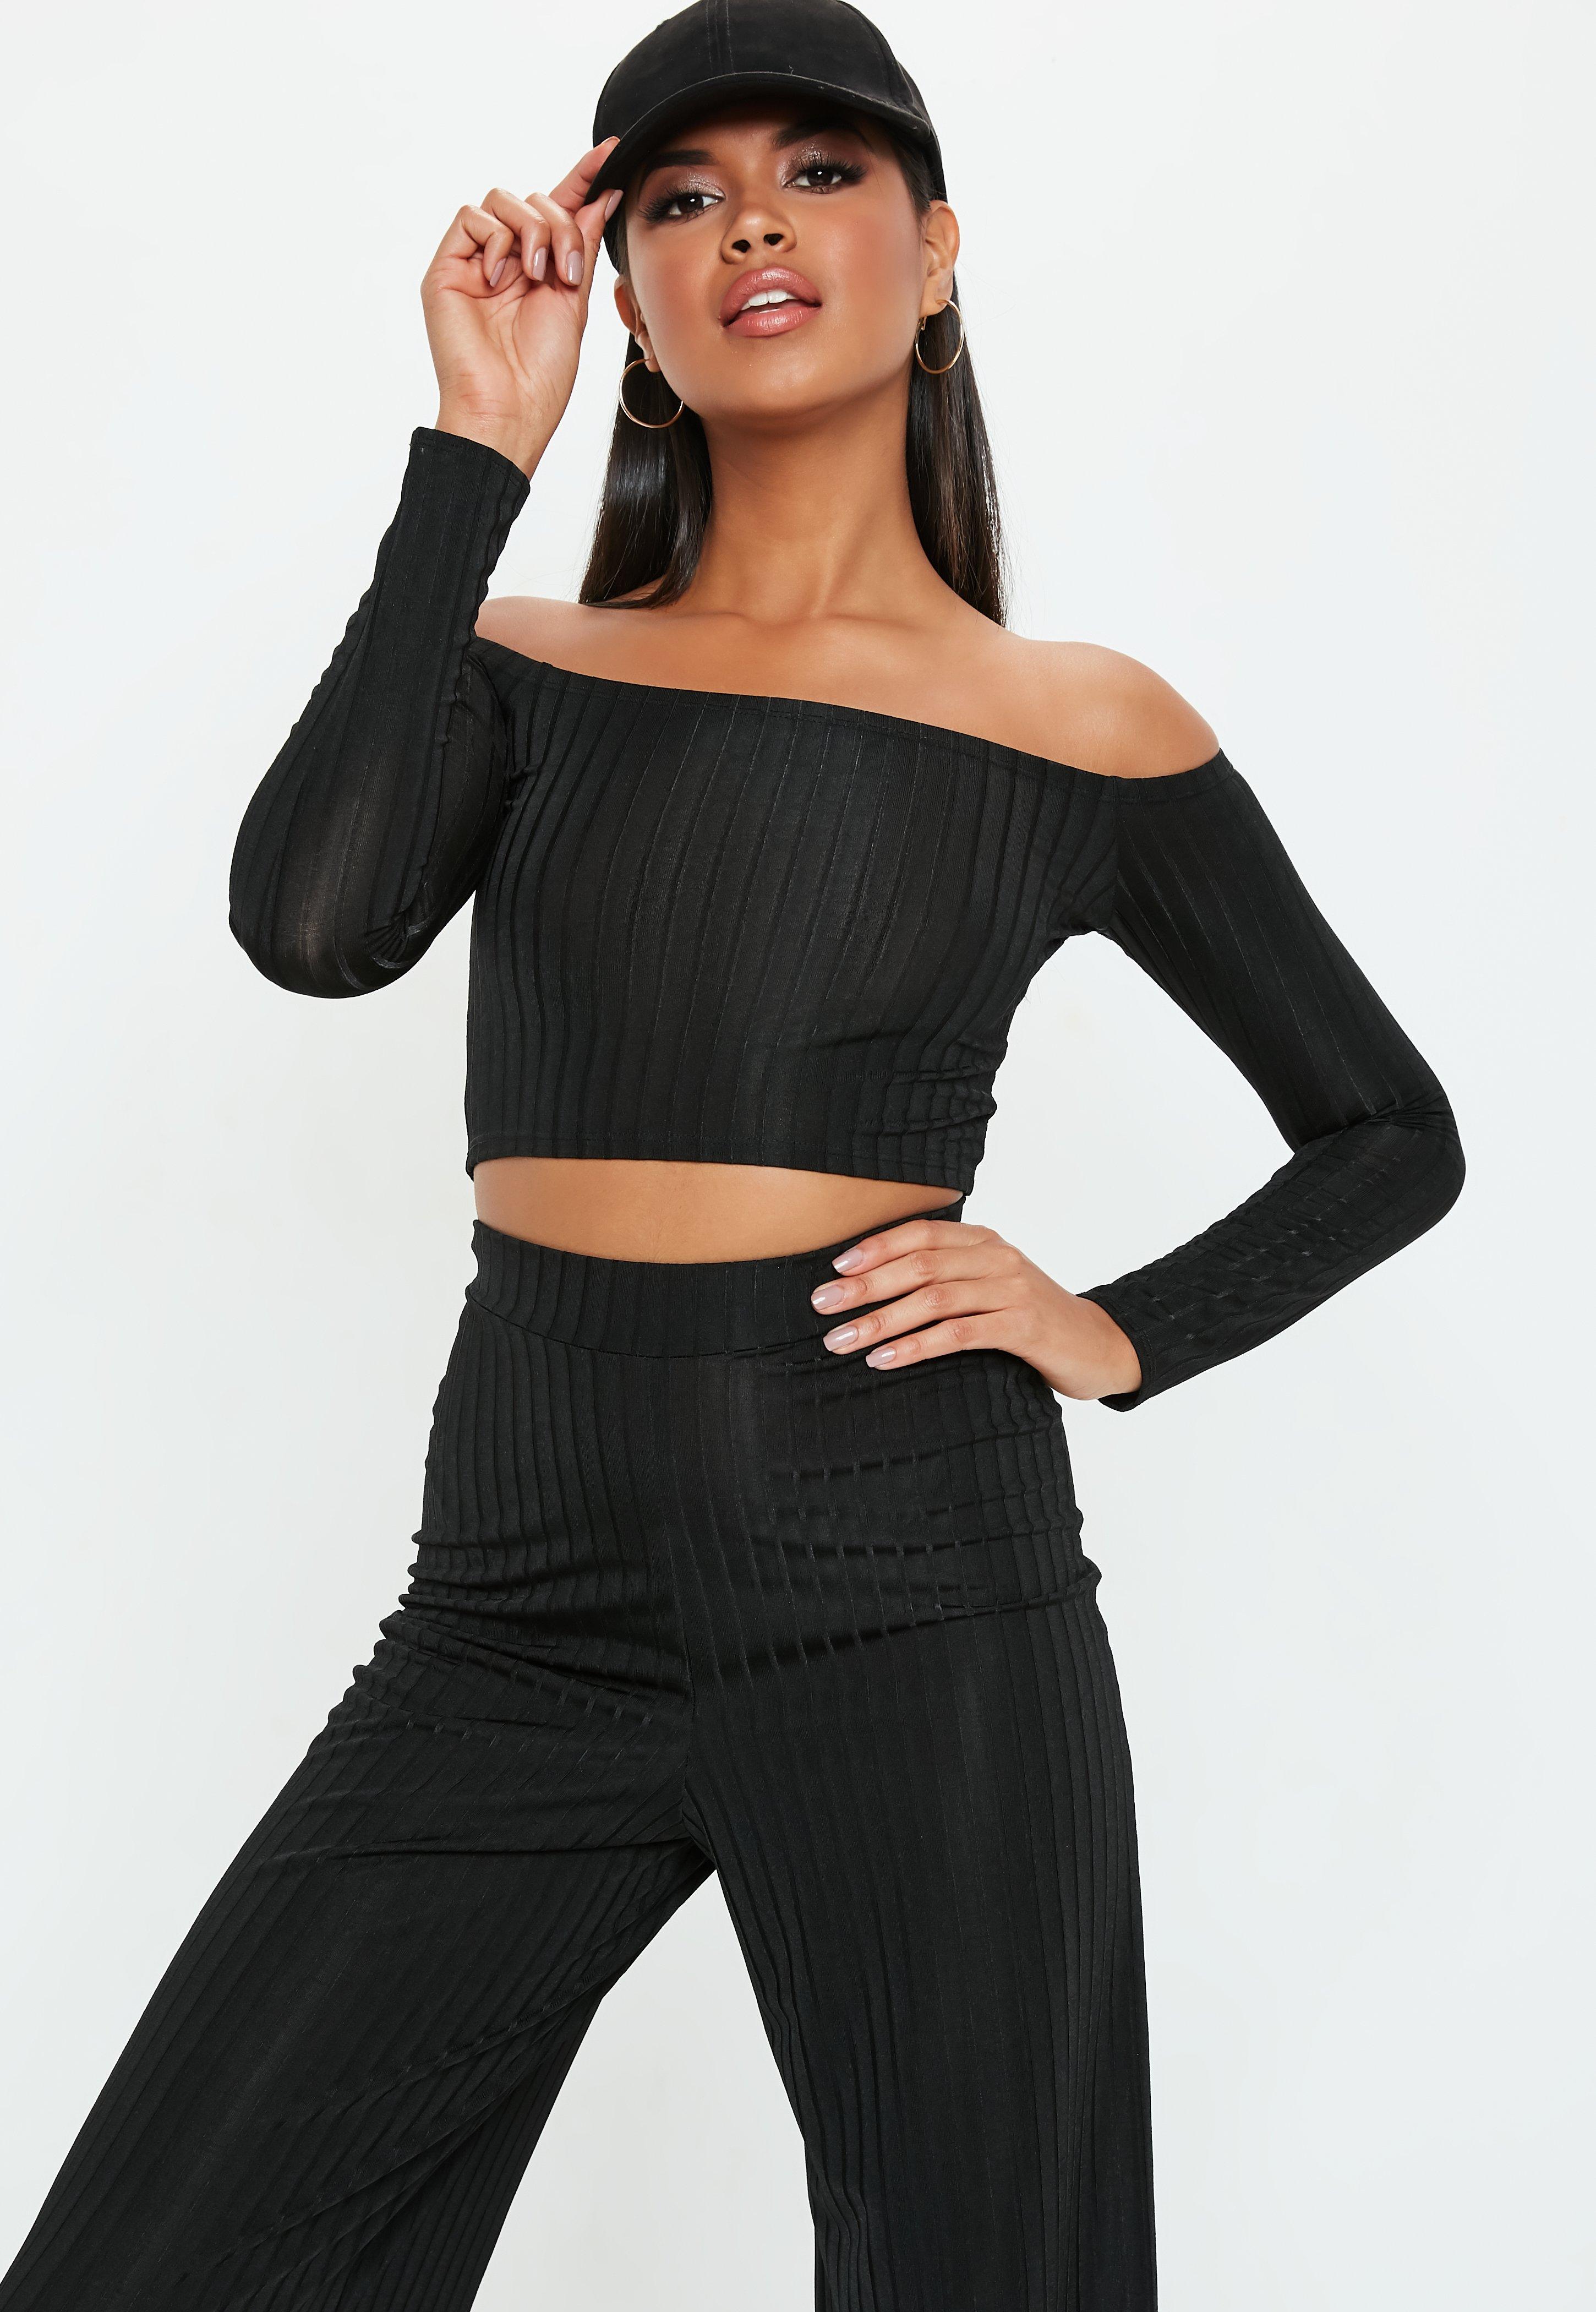 64a74d3852a Black Shiny Ribbed Bardot Crop Top | Missguided Ireland